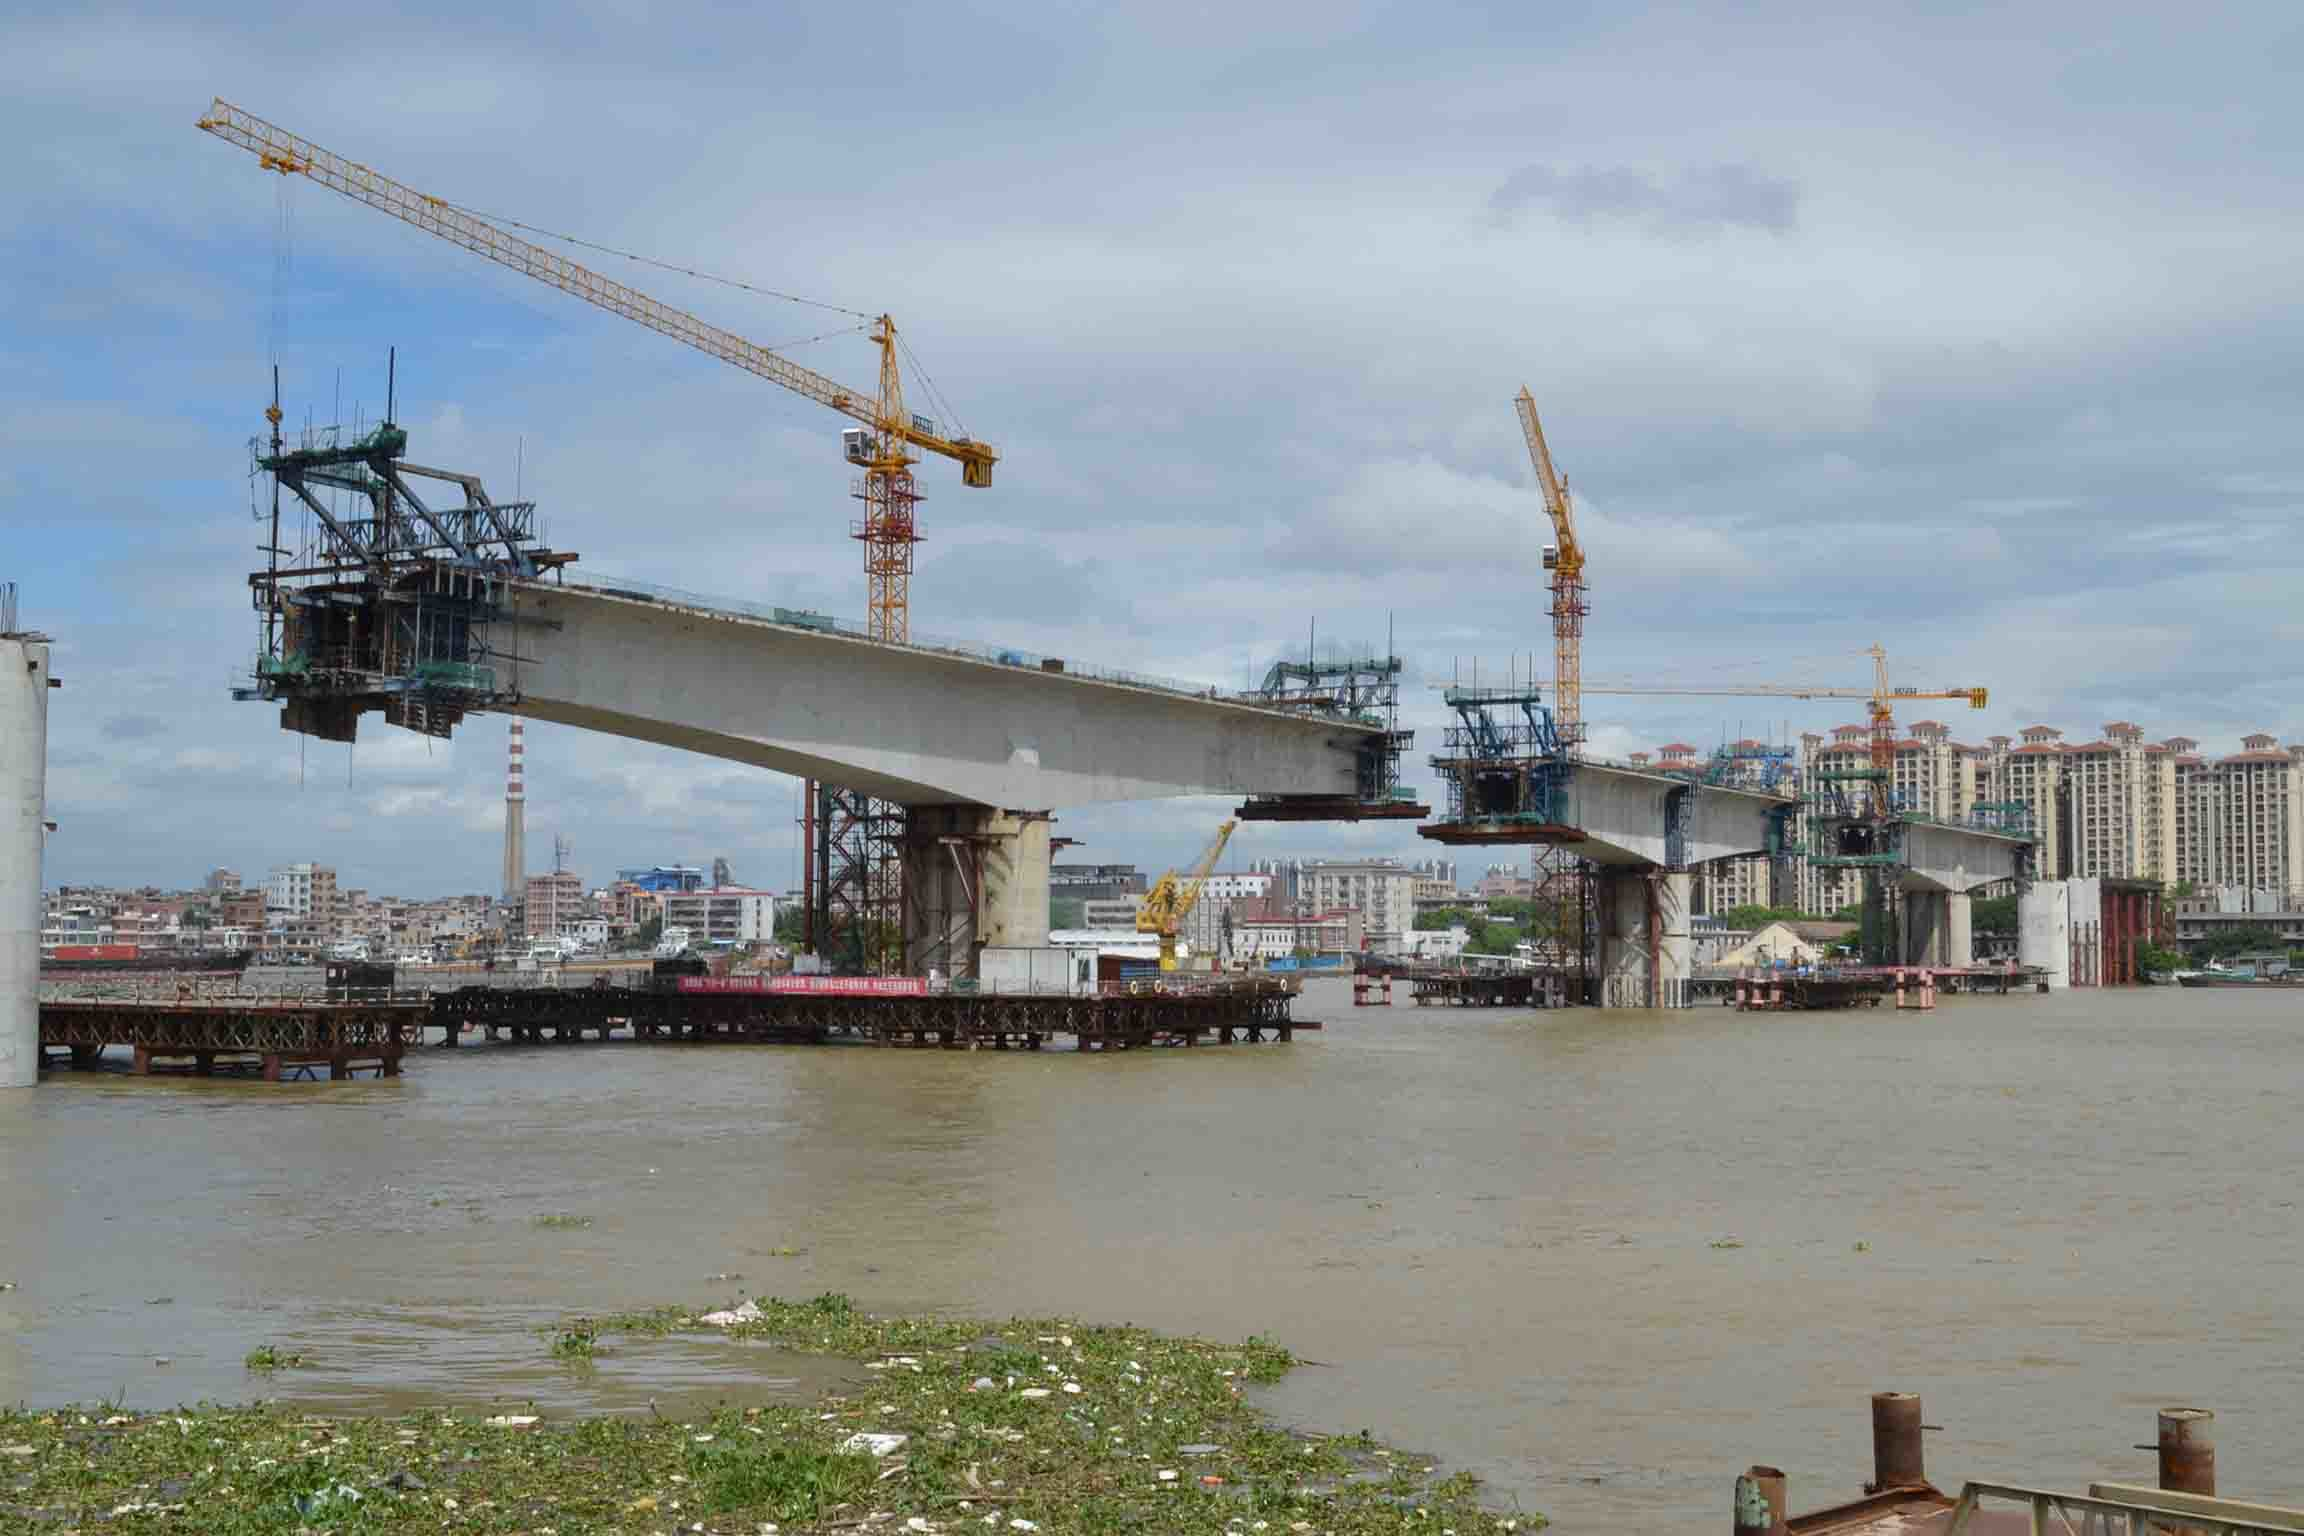 6t Qtz80 (TC6013B) and Maximum Height 210m Construction Crane